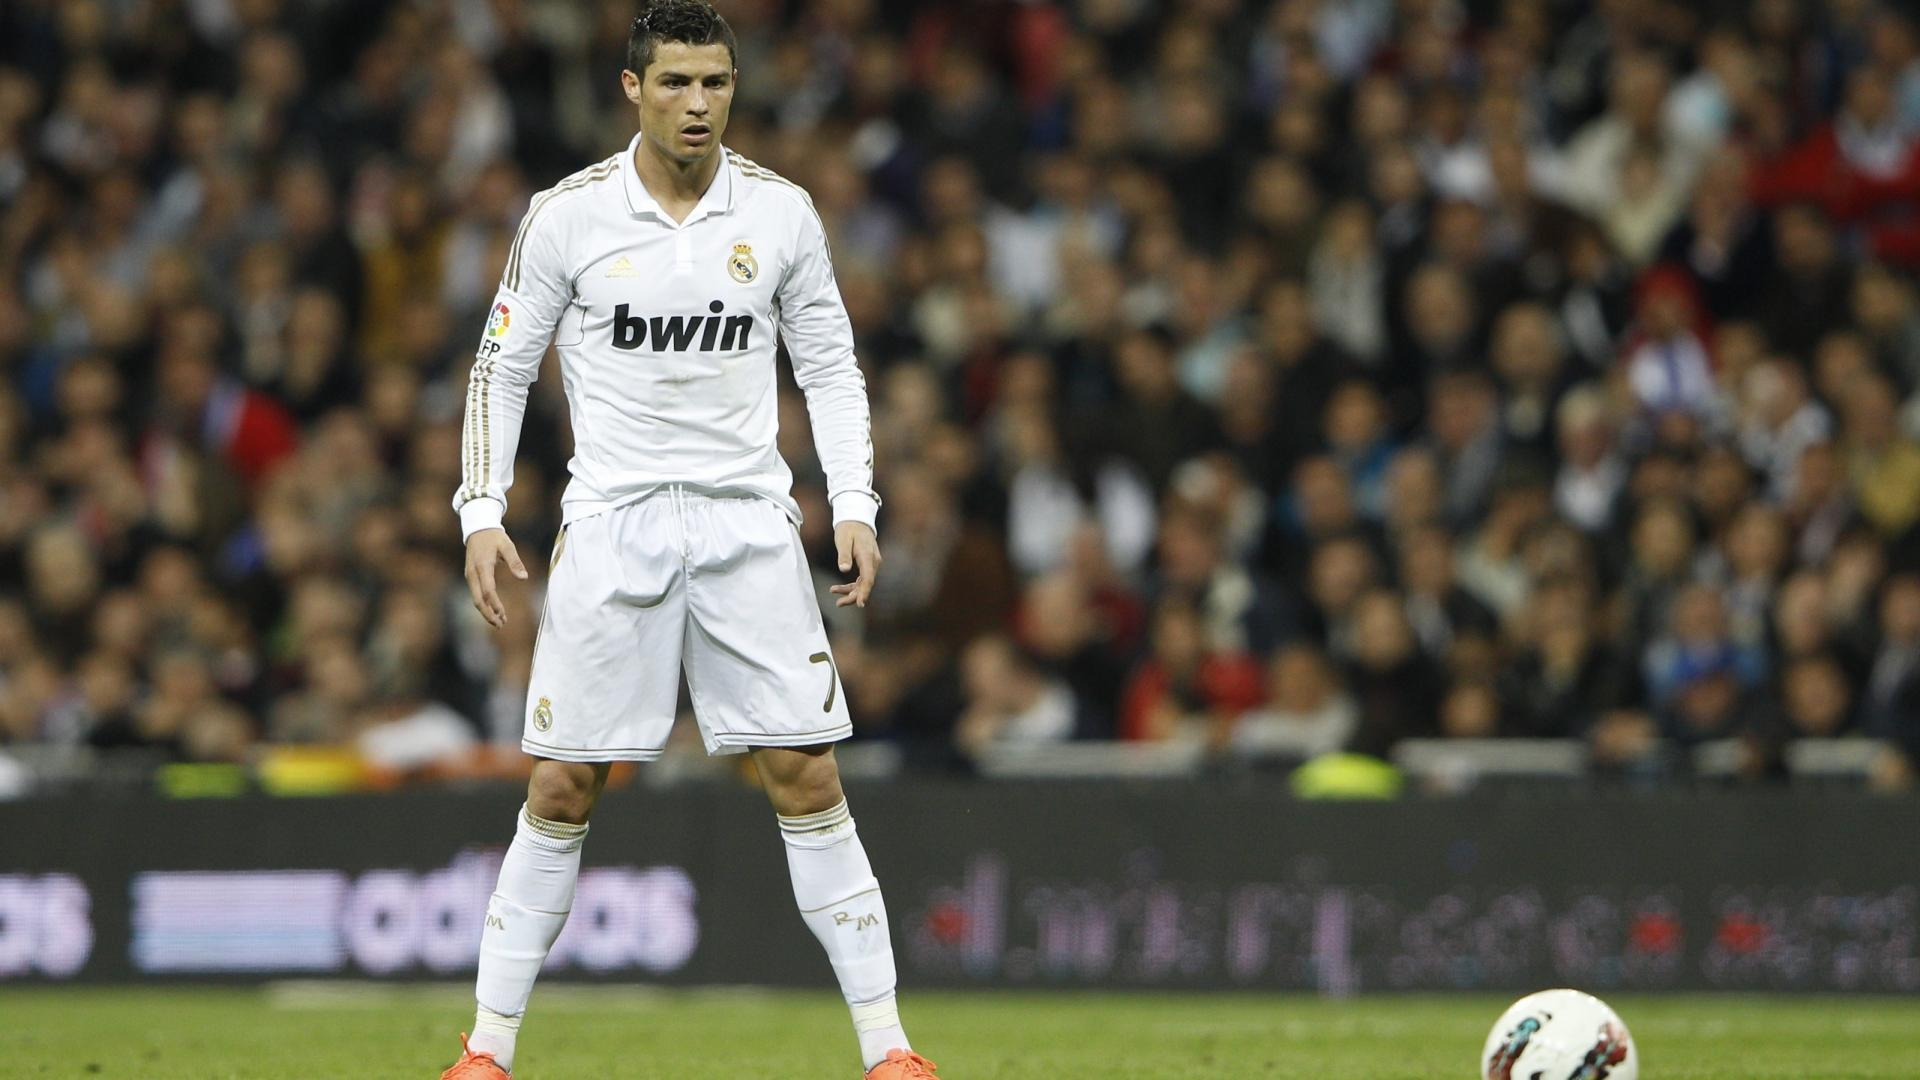 Cristiano Ronaldo Hd Wallpapers Wallpaper Cave